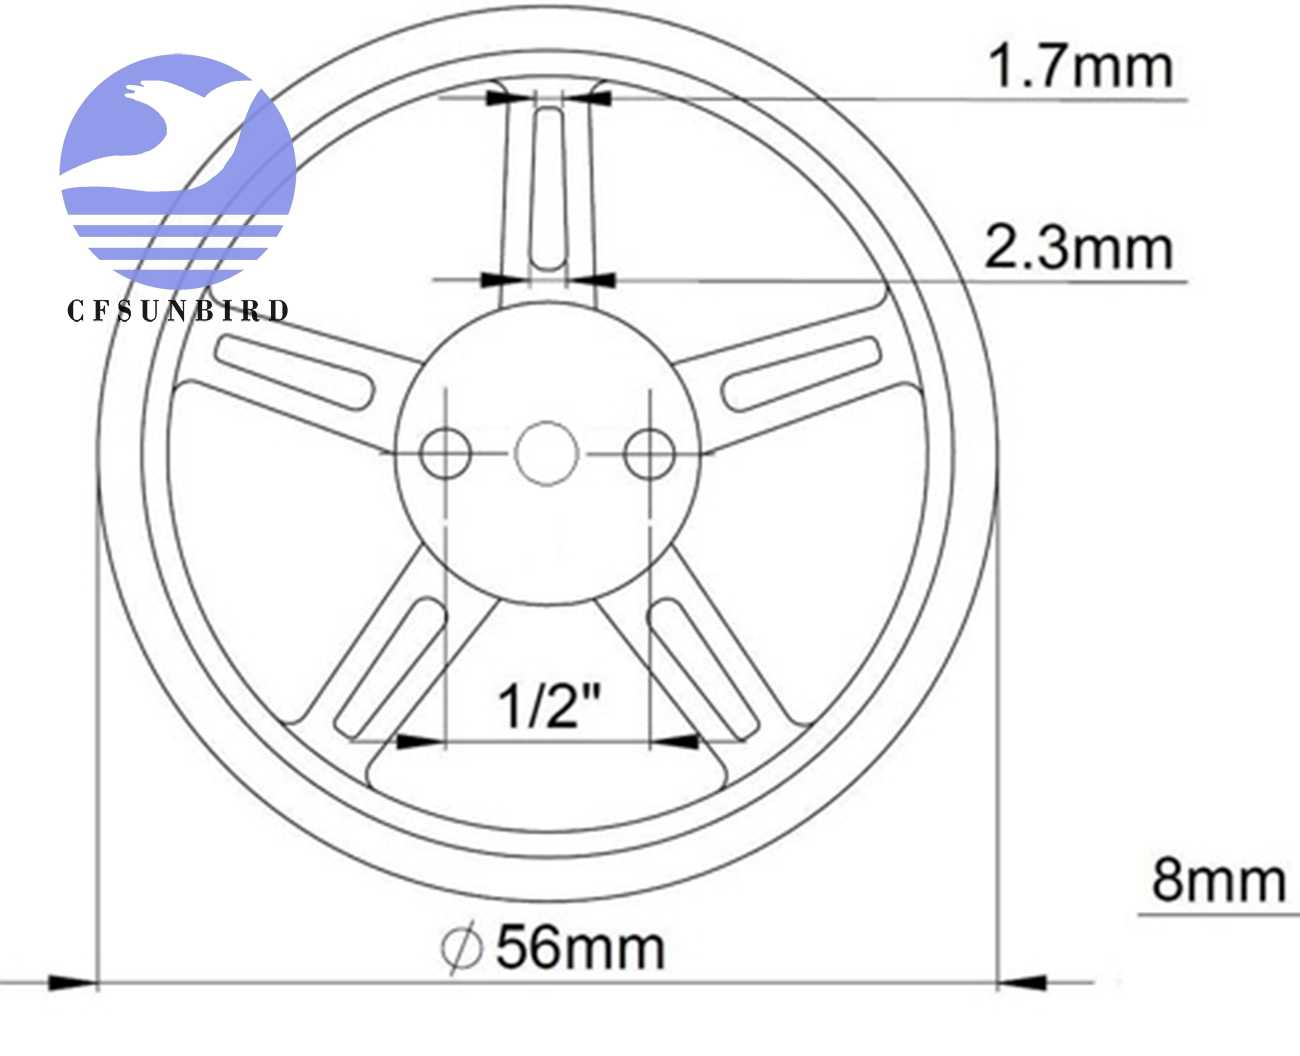 10 pcs גלגל עבור SG90 9g 360 תואר רציף סיבוב מיקרו רובוט סרוו FS90R